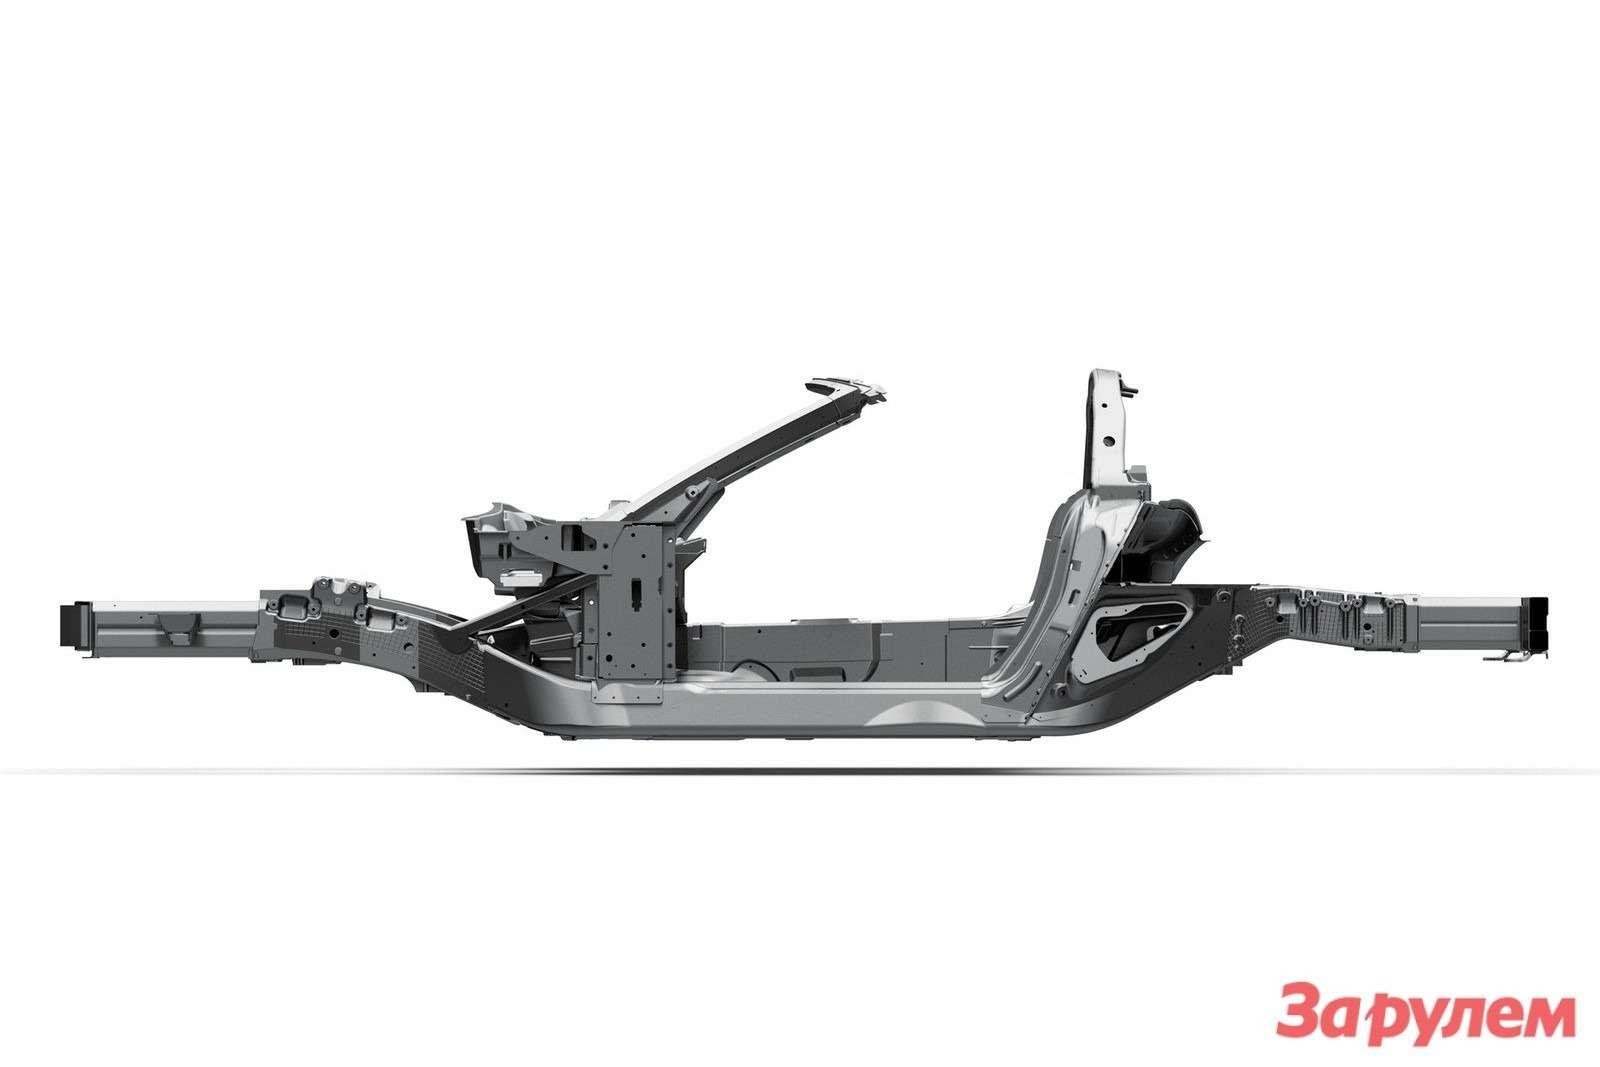 Chevrolet-Corvette_C7_Stingray_2014_1600x1200_wallpaper_29